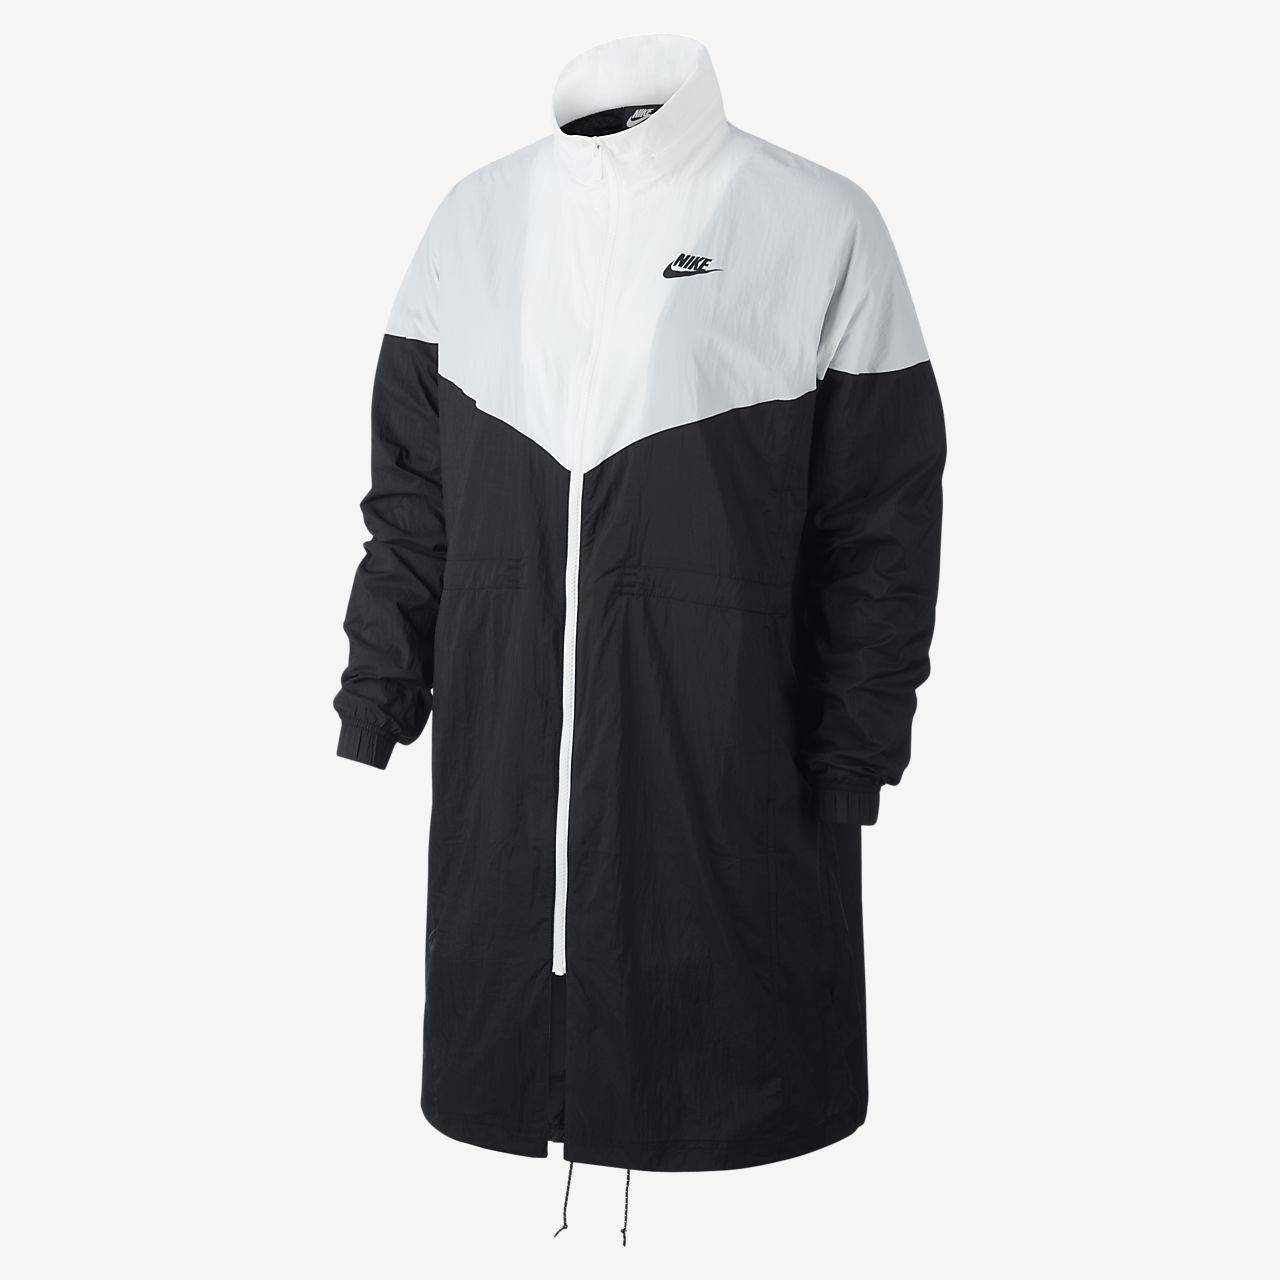 af689105680 Nike Sportswear Windrunner Women's Jacket. Nike.com AE